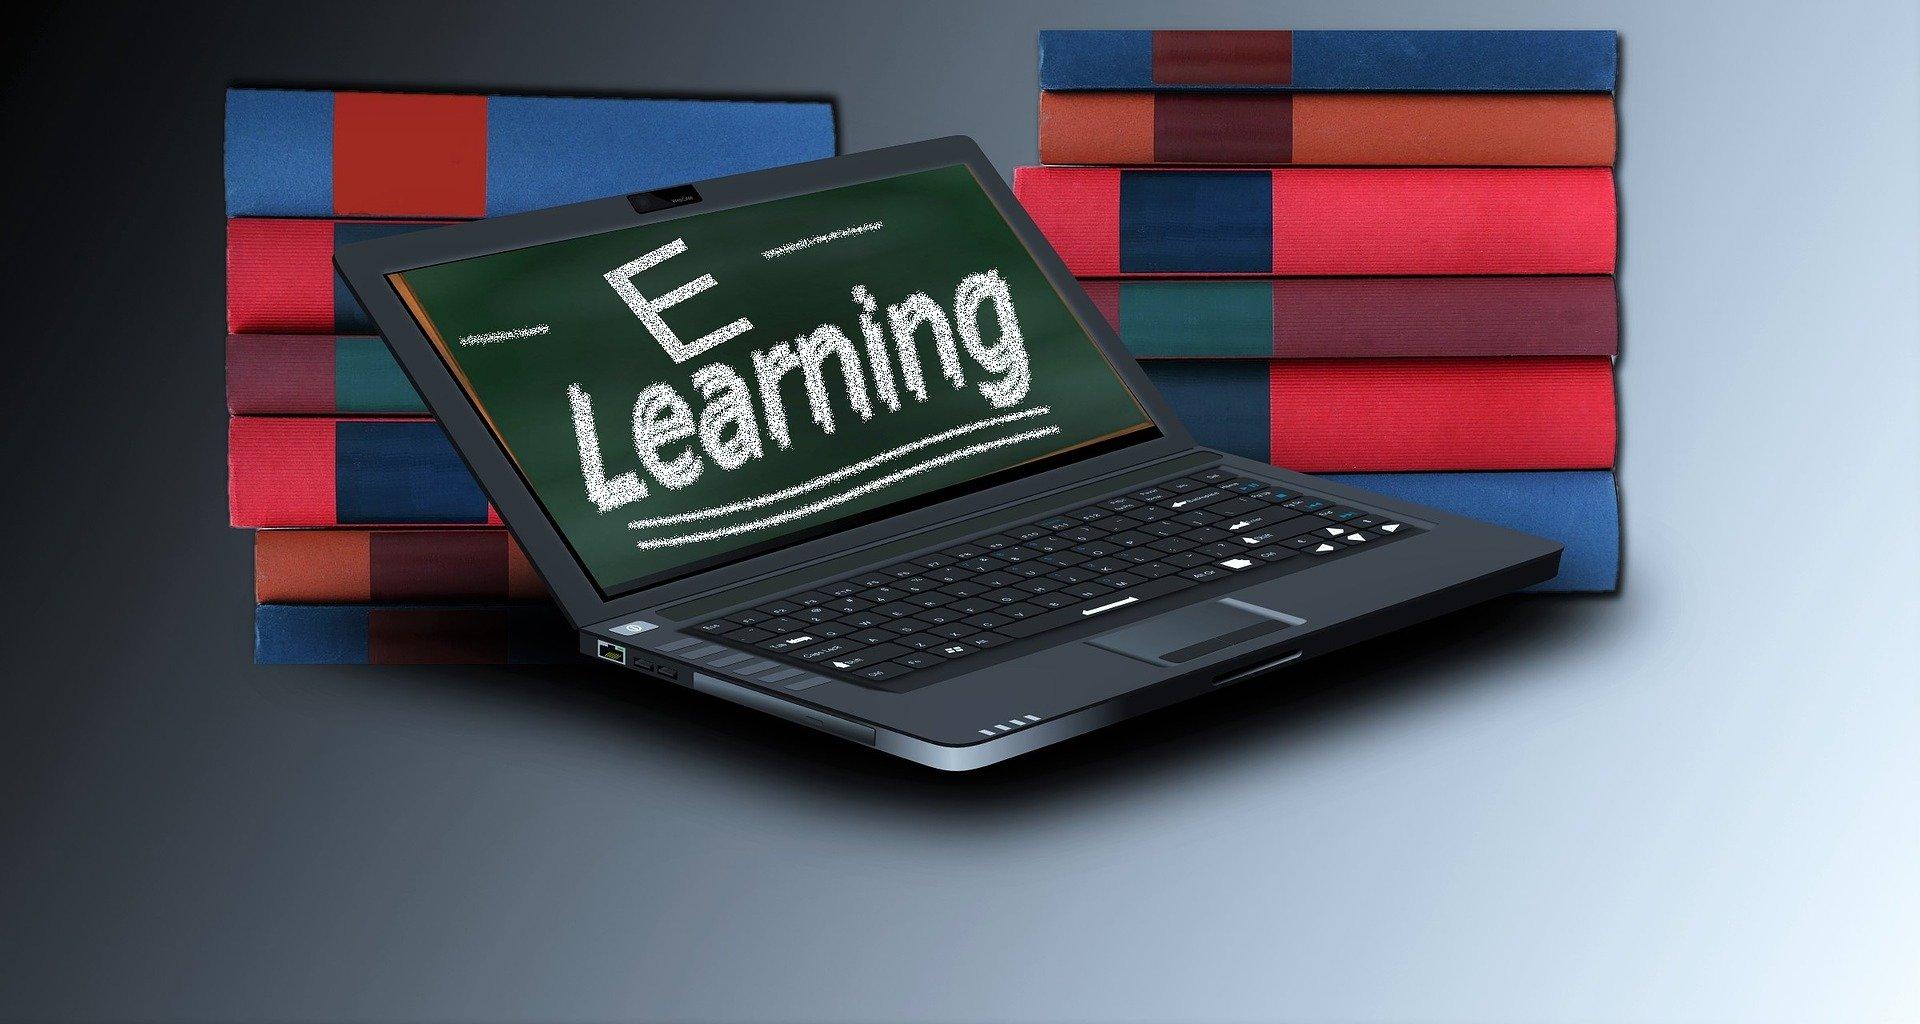 learn-977545_1920 (2)Karlhh